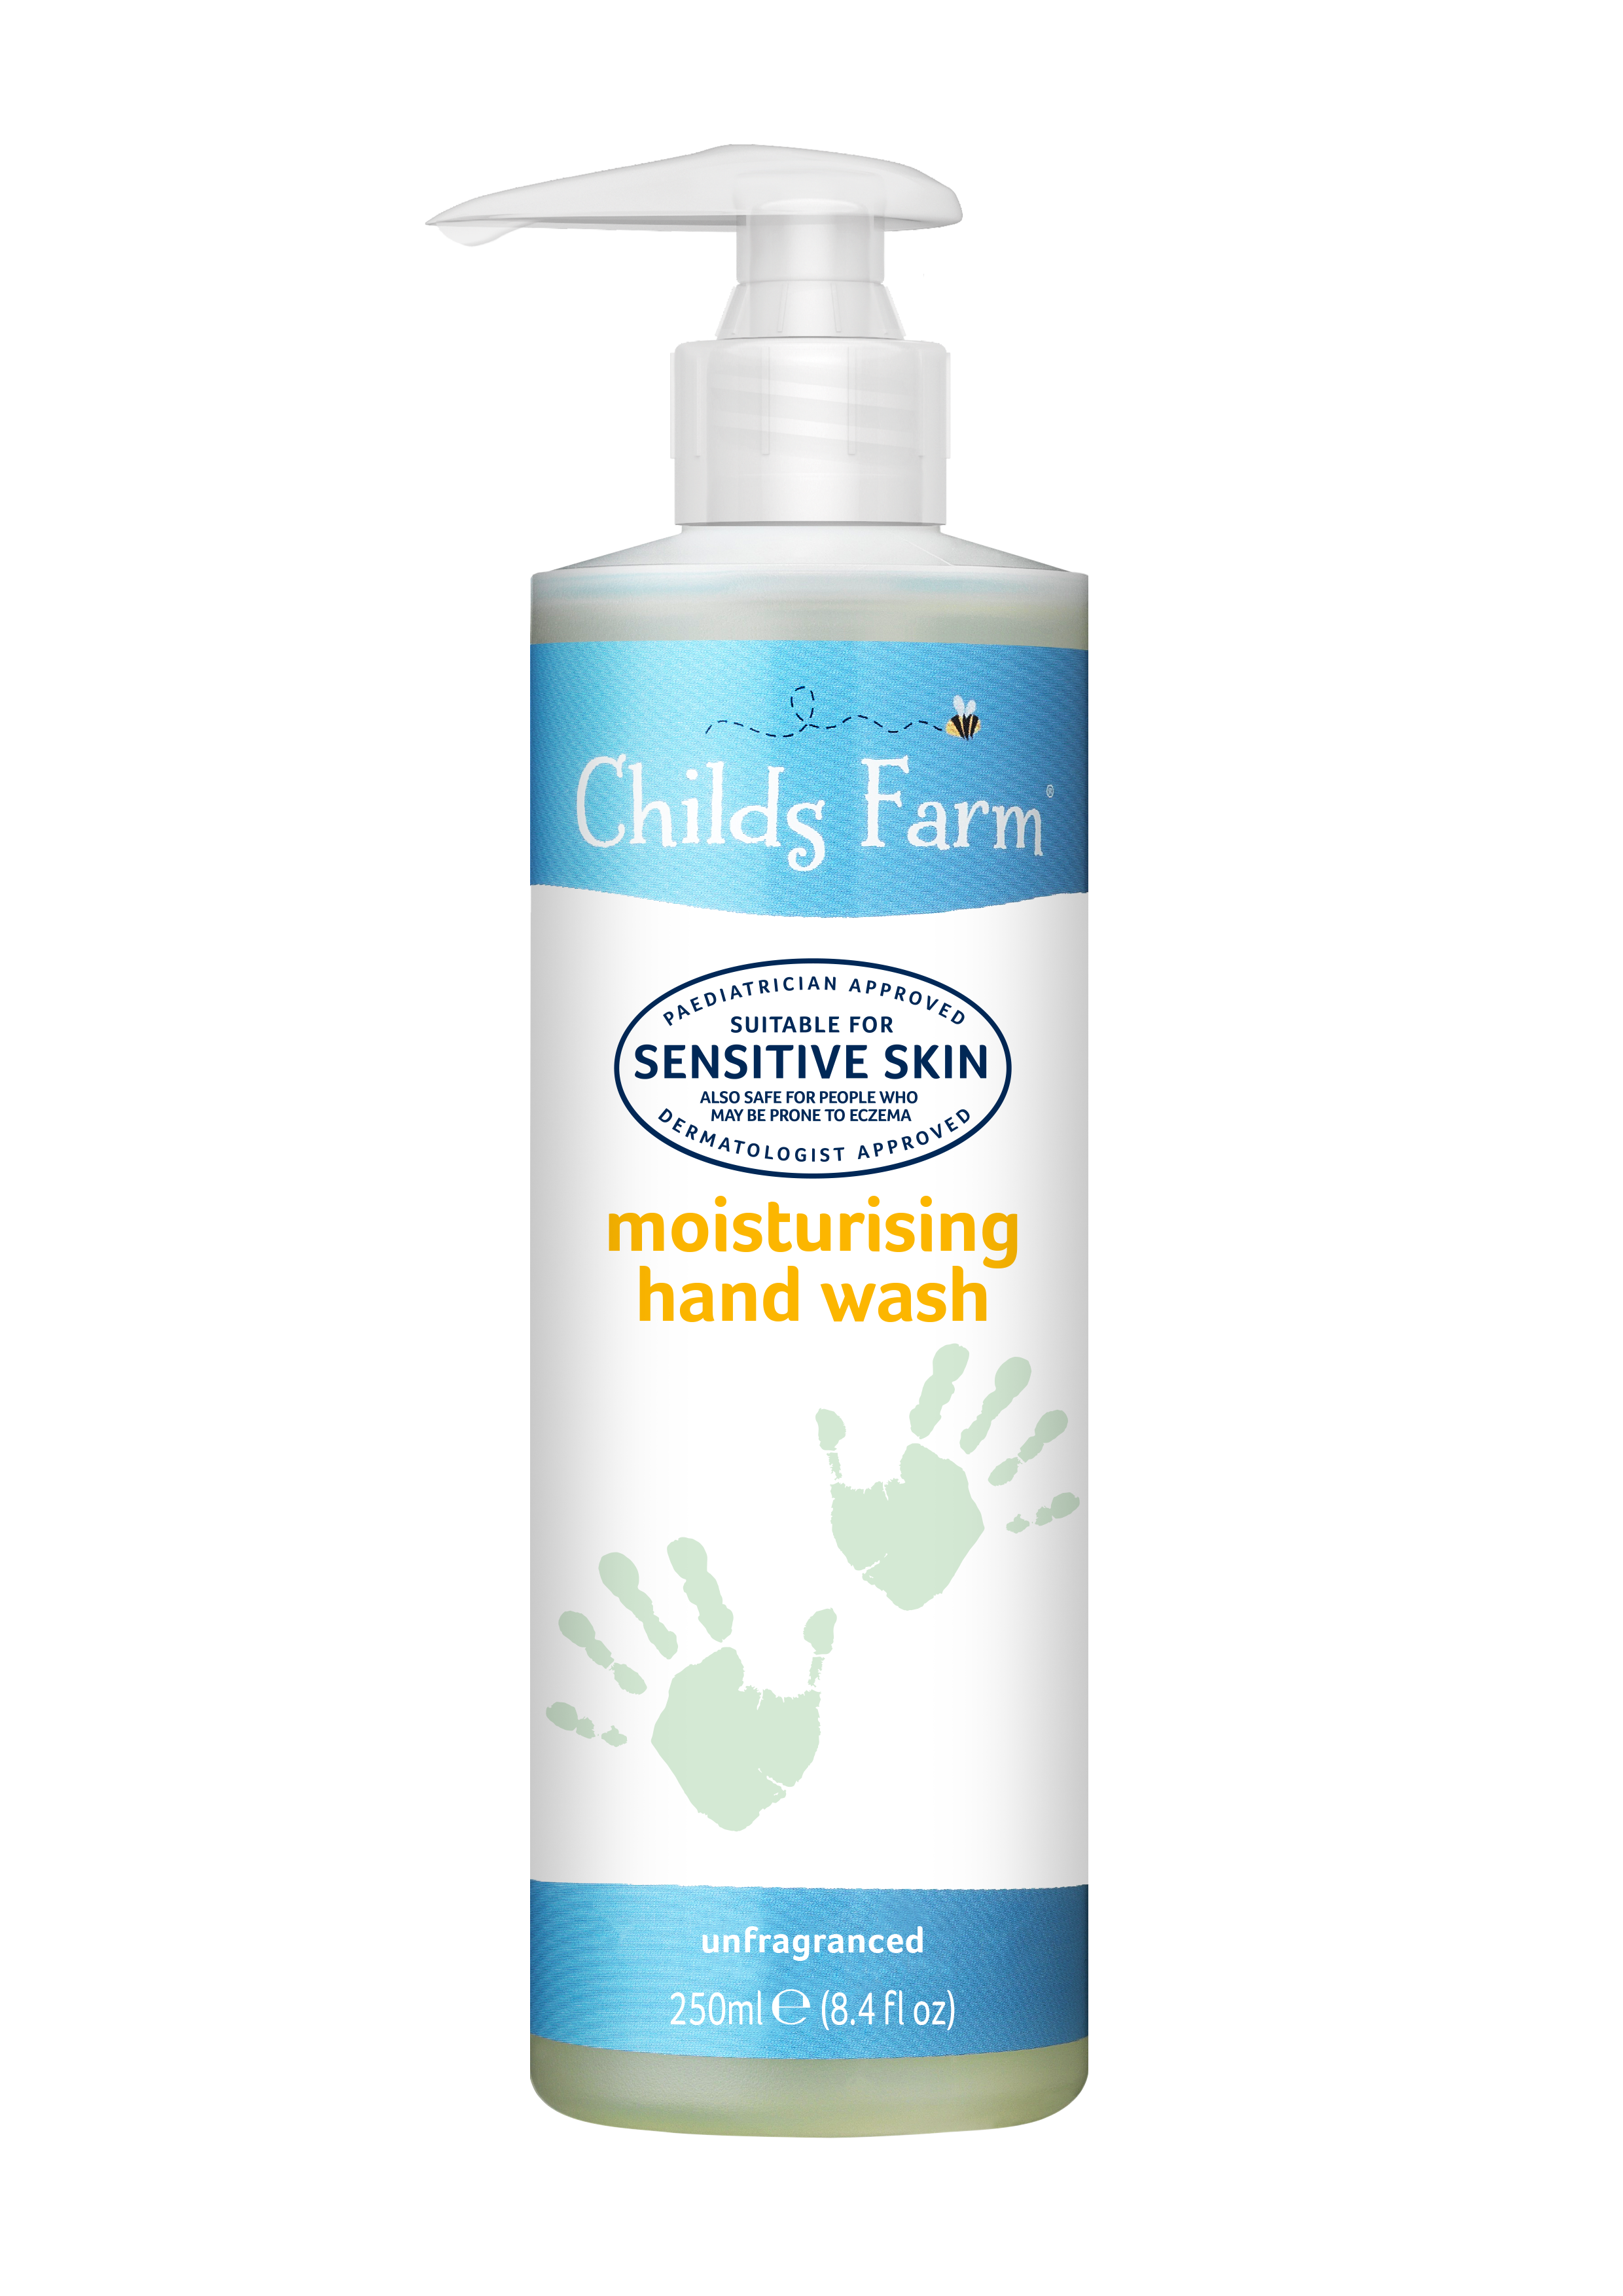 Childs Farm Launches Sensitive Hand Wash